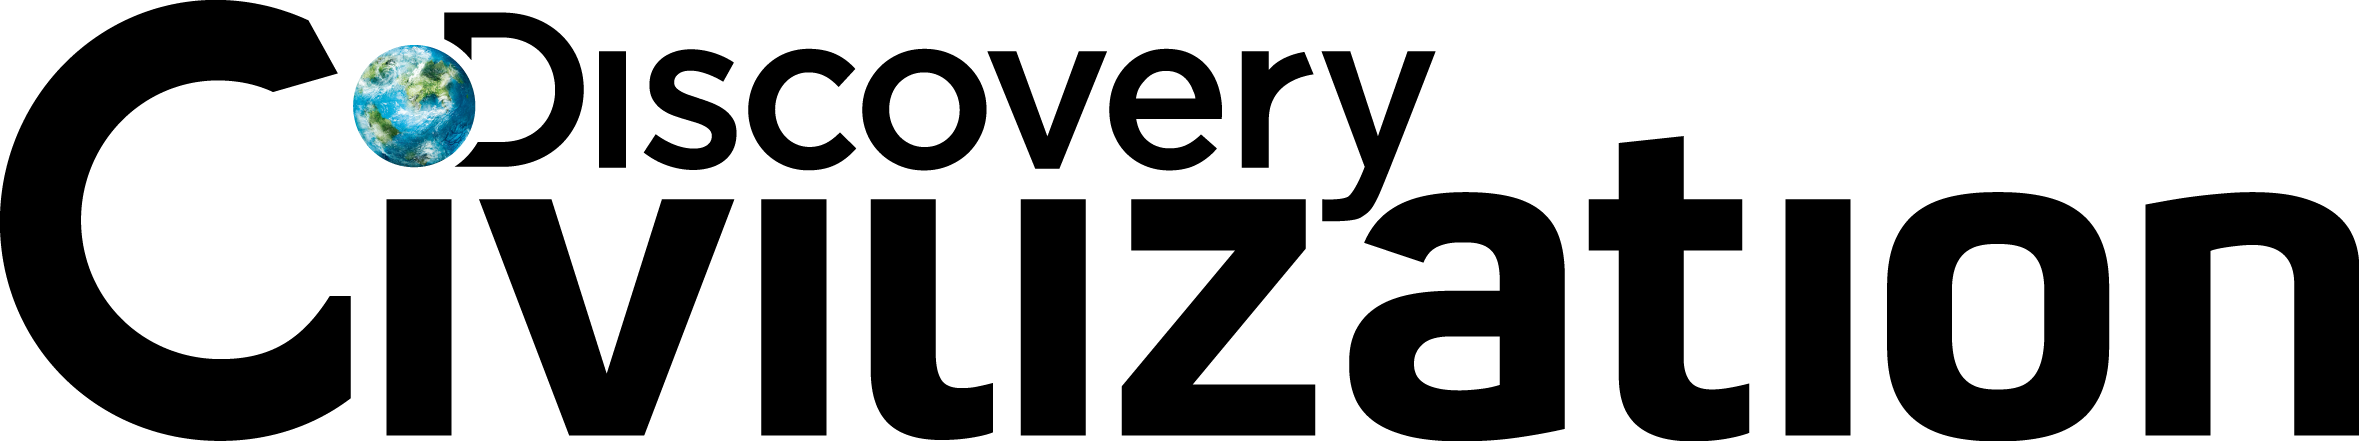 Civilization (Latin America) - Logopedia, the logo and branding site